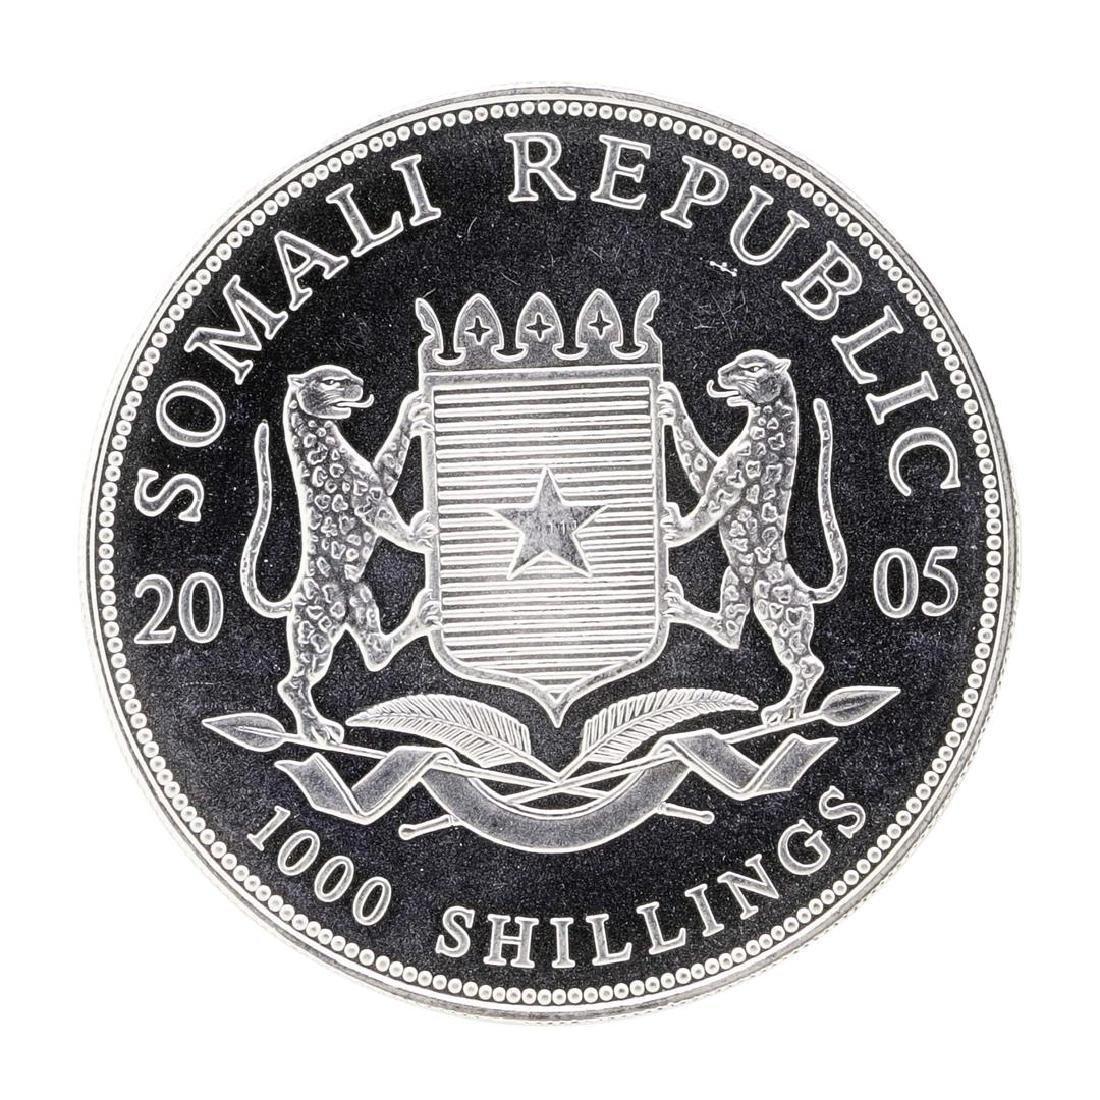 2005 1 oz. Silver Somalian African Elephant Coin - 2